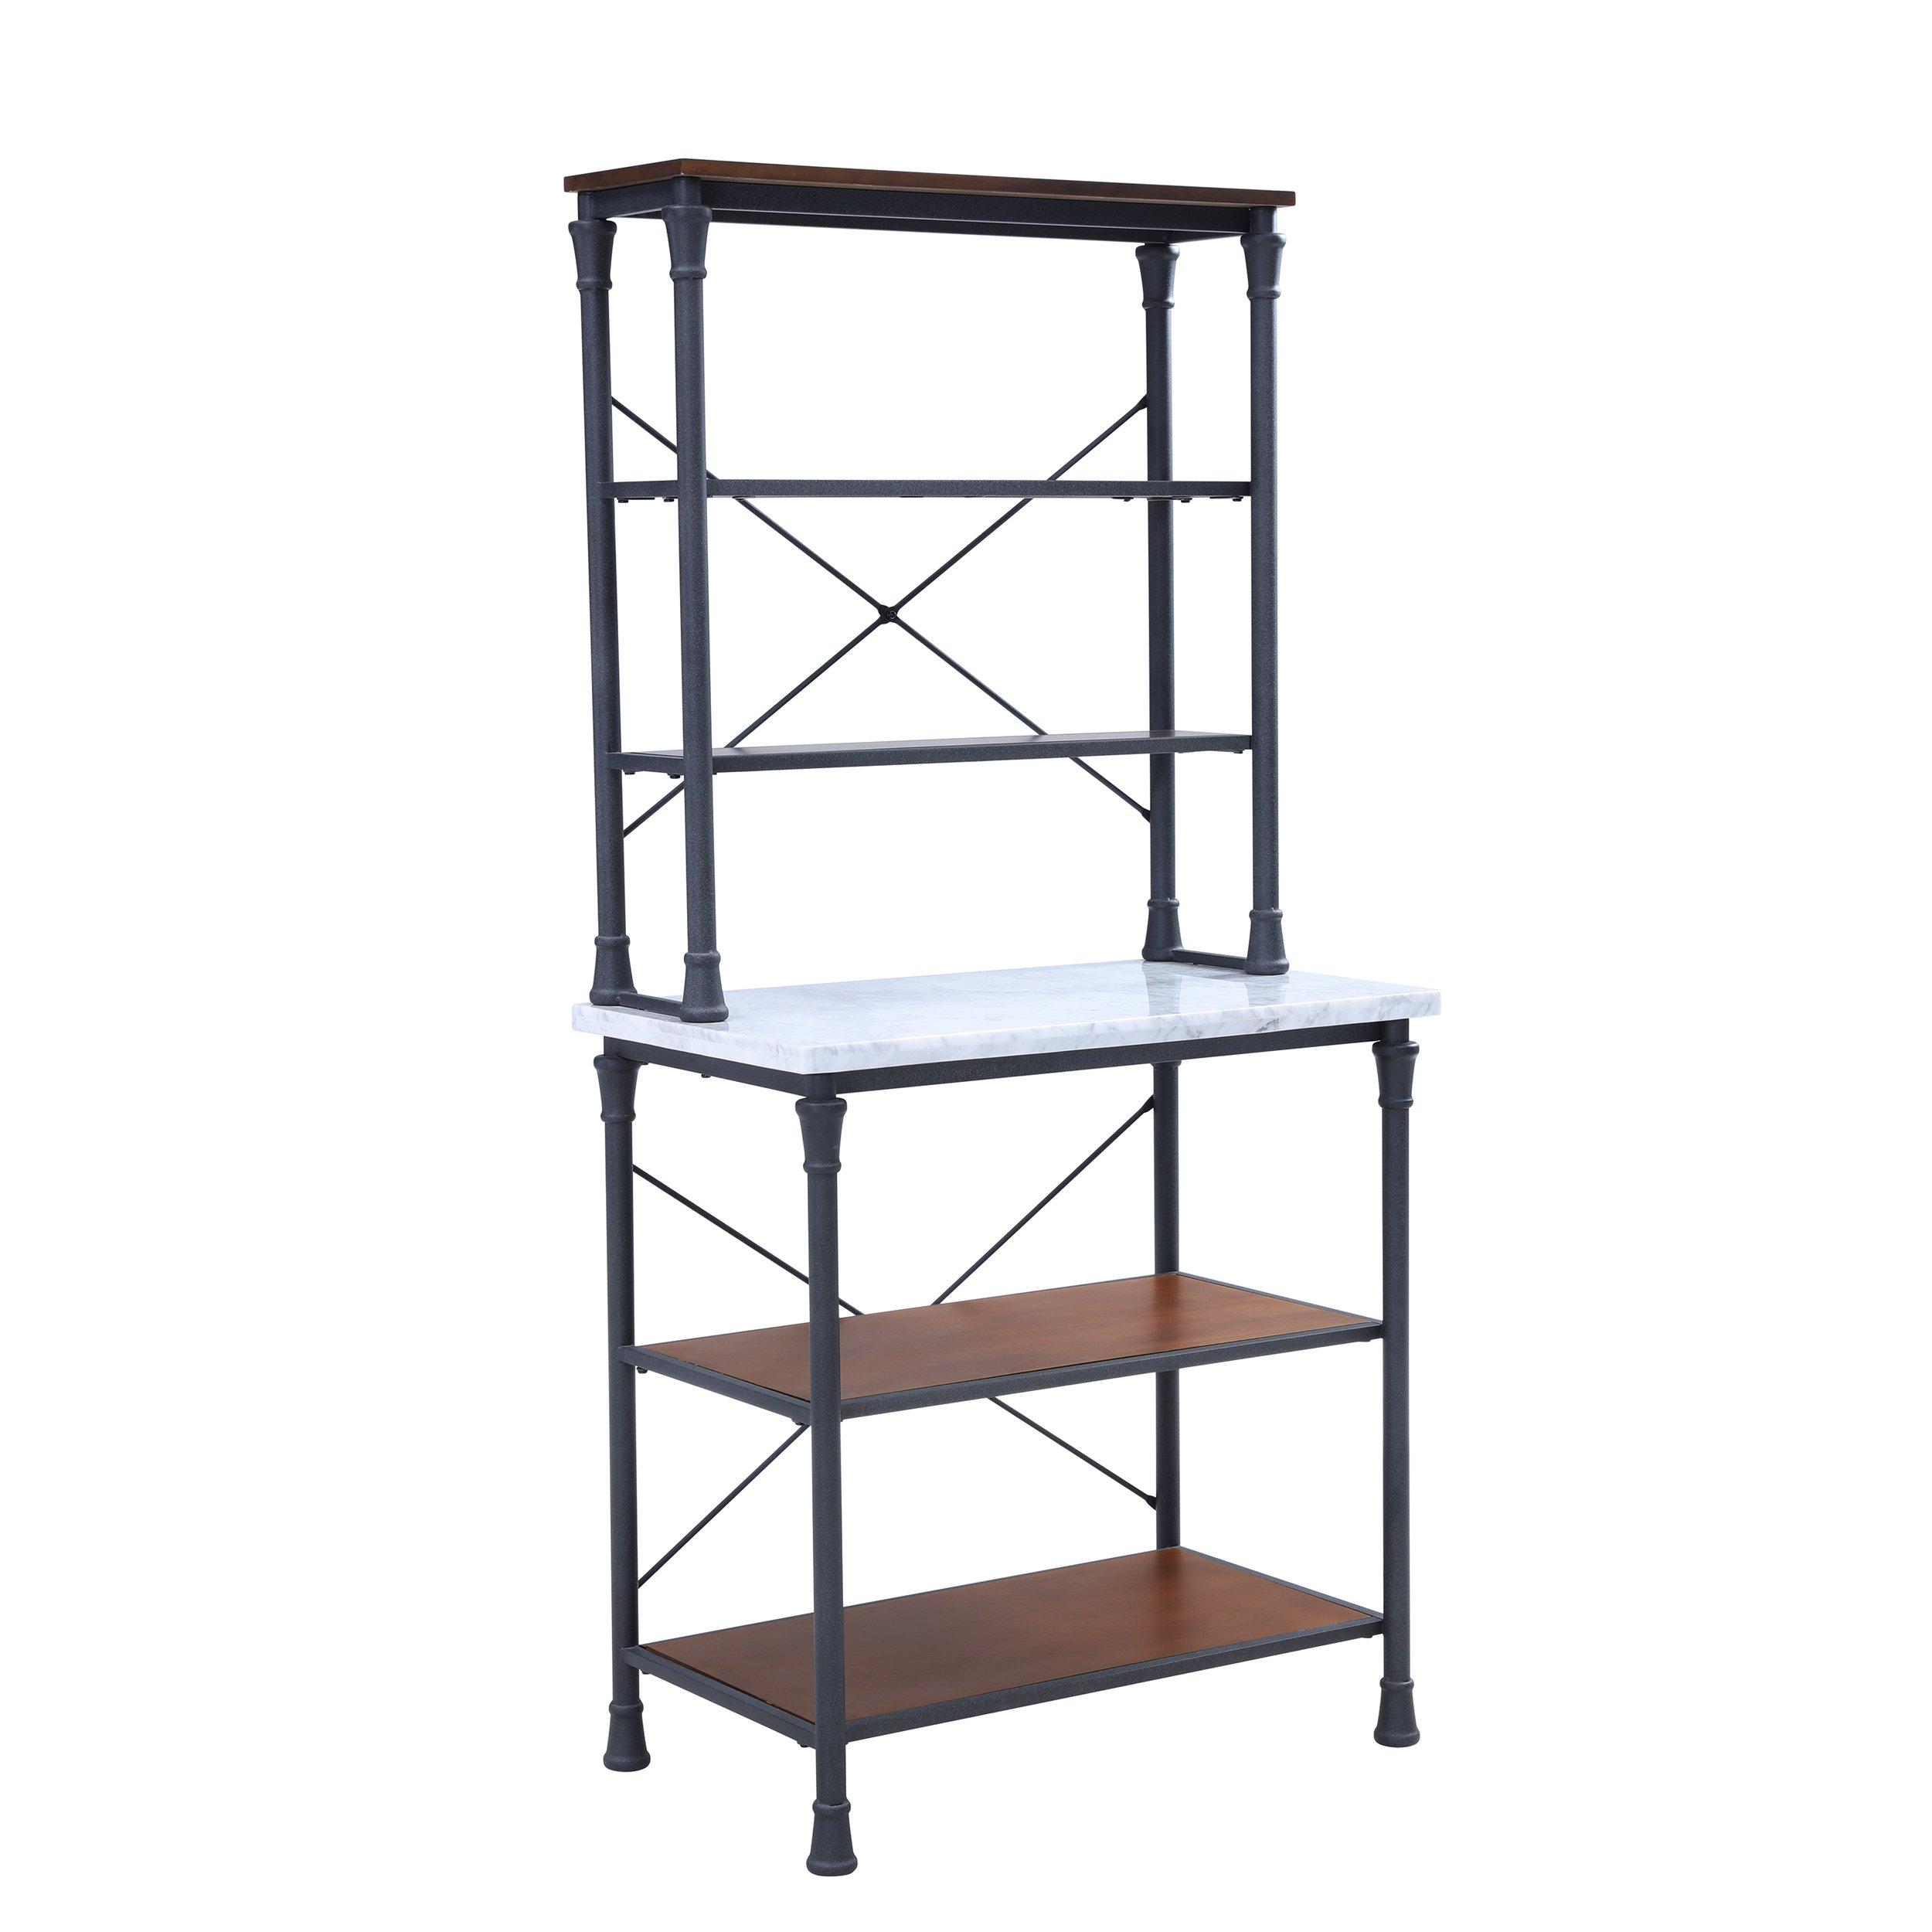 Furniture HotSpot Metal Bakers Rack - Industrial Backers Stand - Metal Frame w/Shelves (Black Frame w/Marble Shelf)